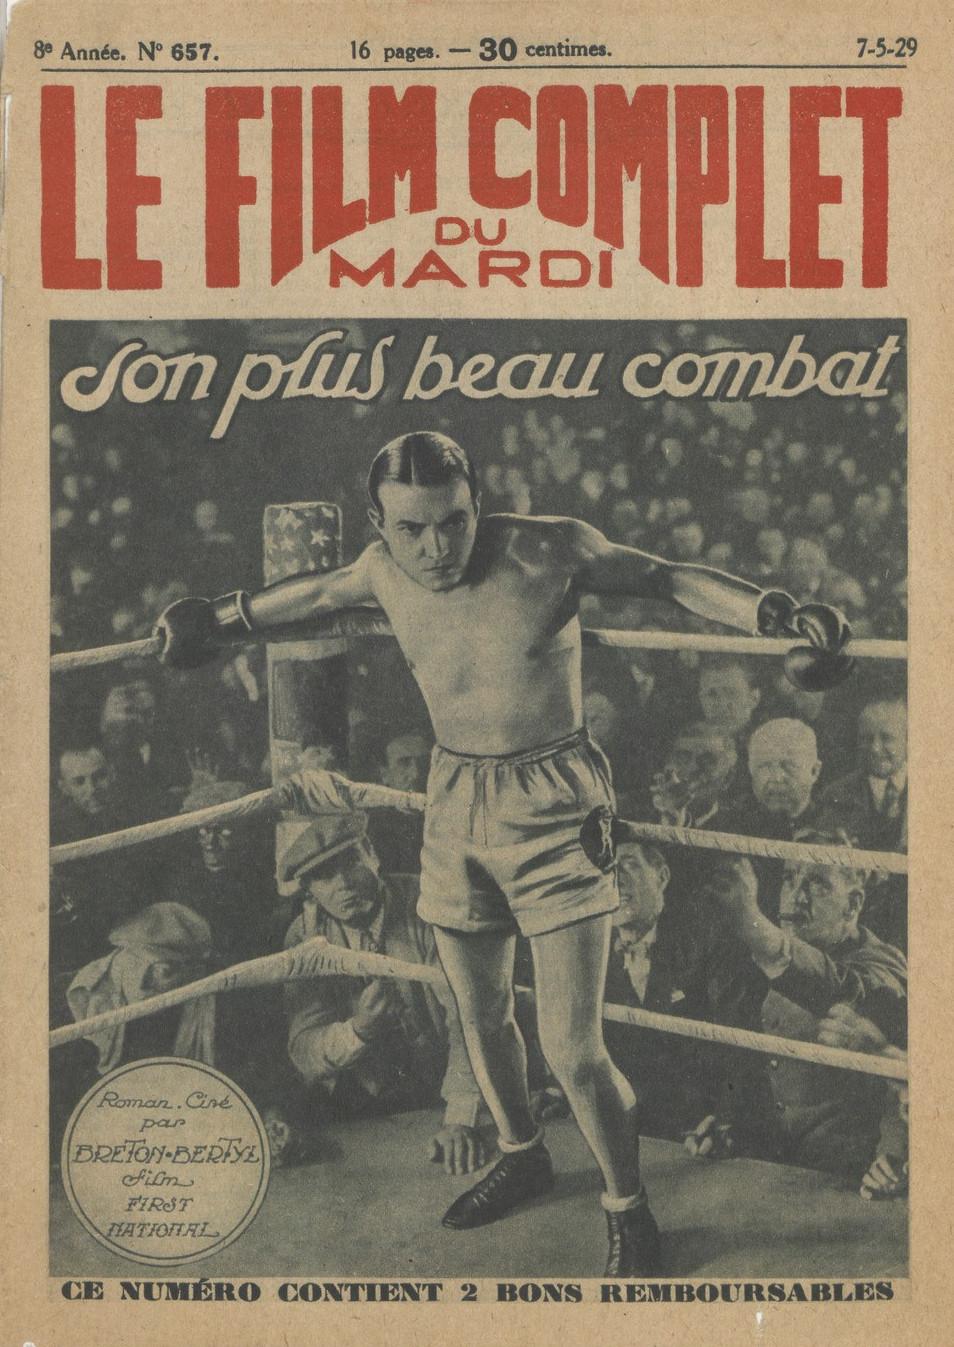 The Patent Leather Kid (Alfred Santell, 1927), en la revista Le Film complet